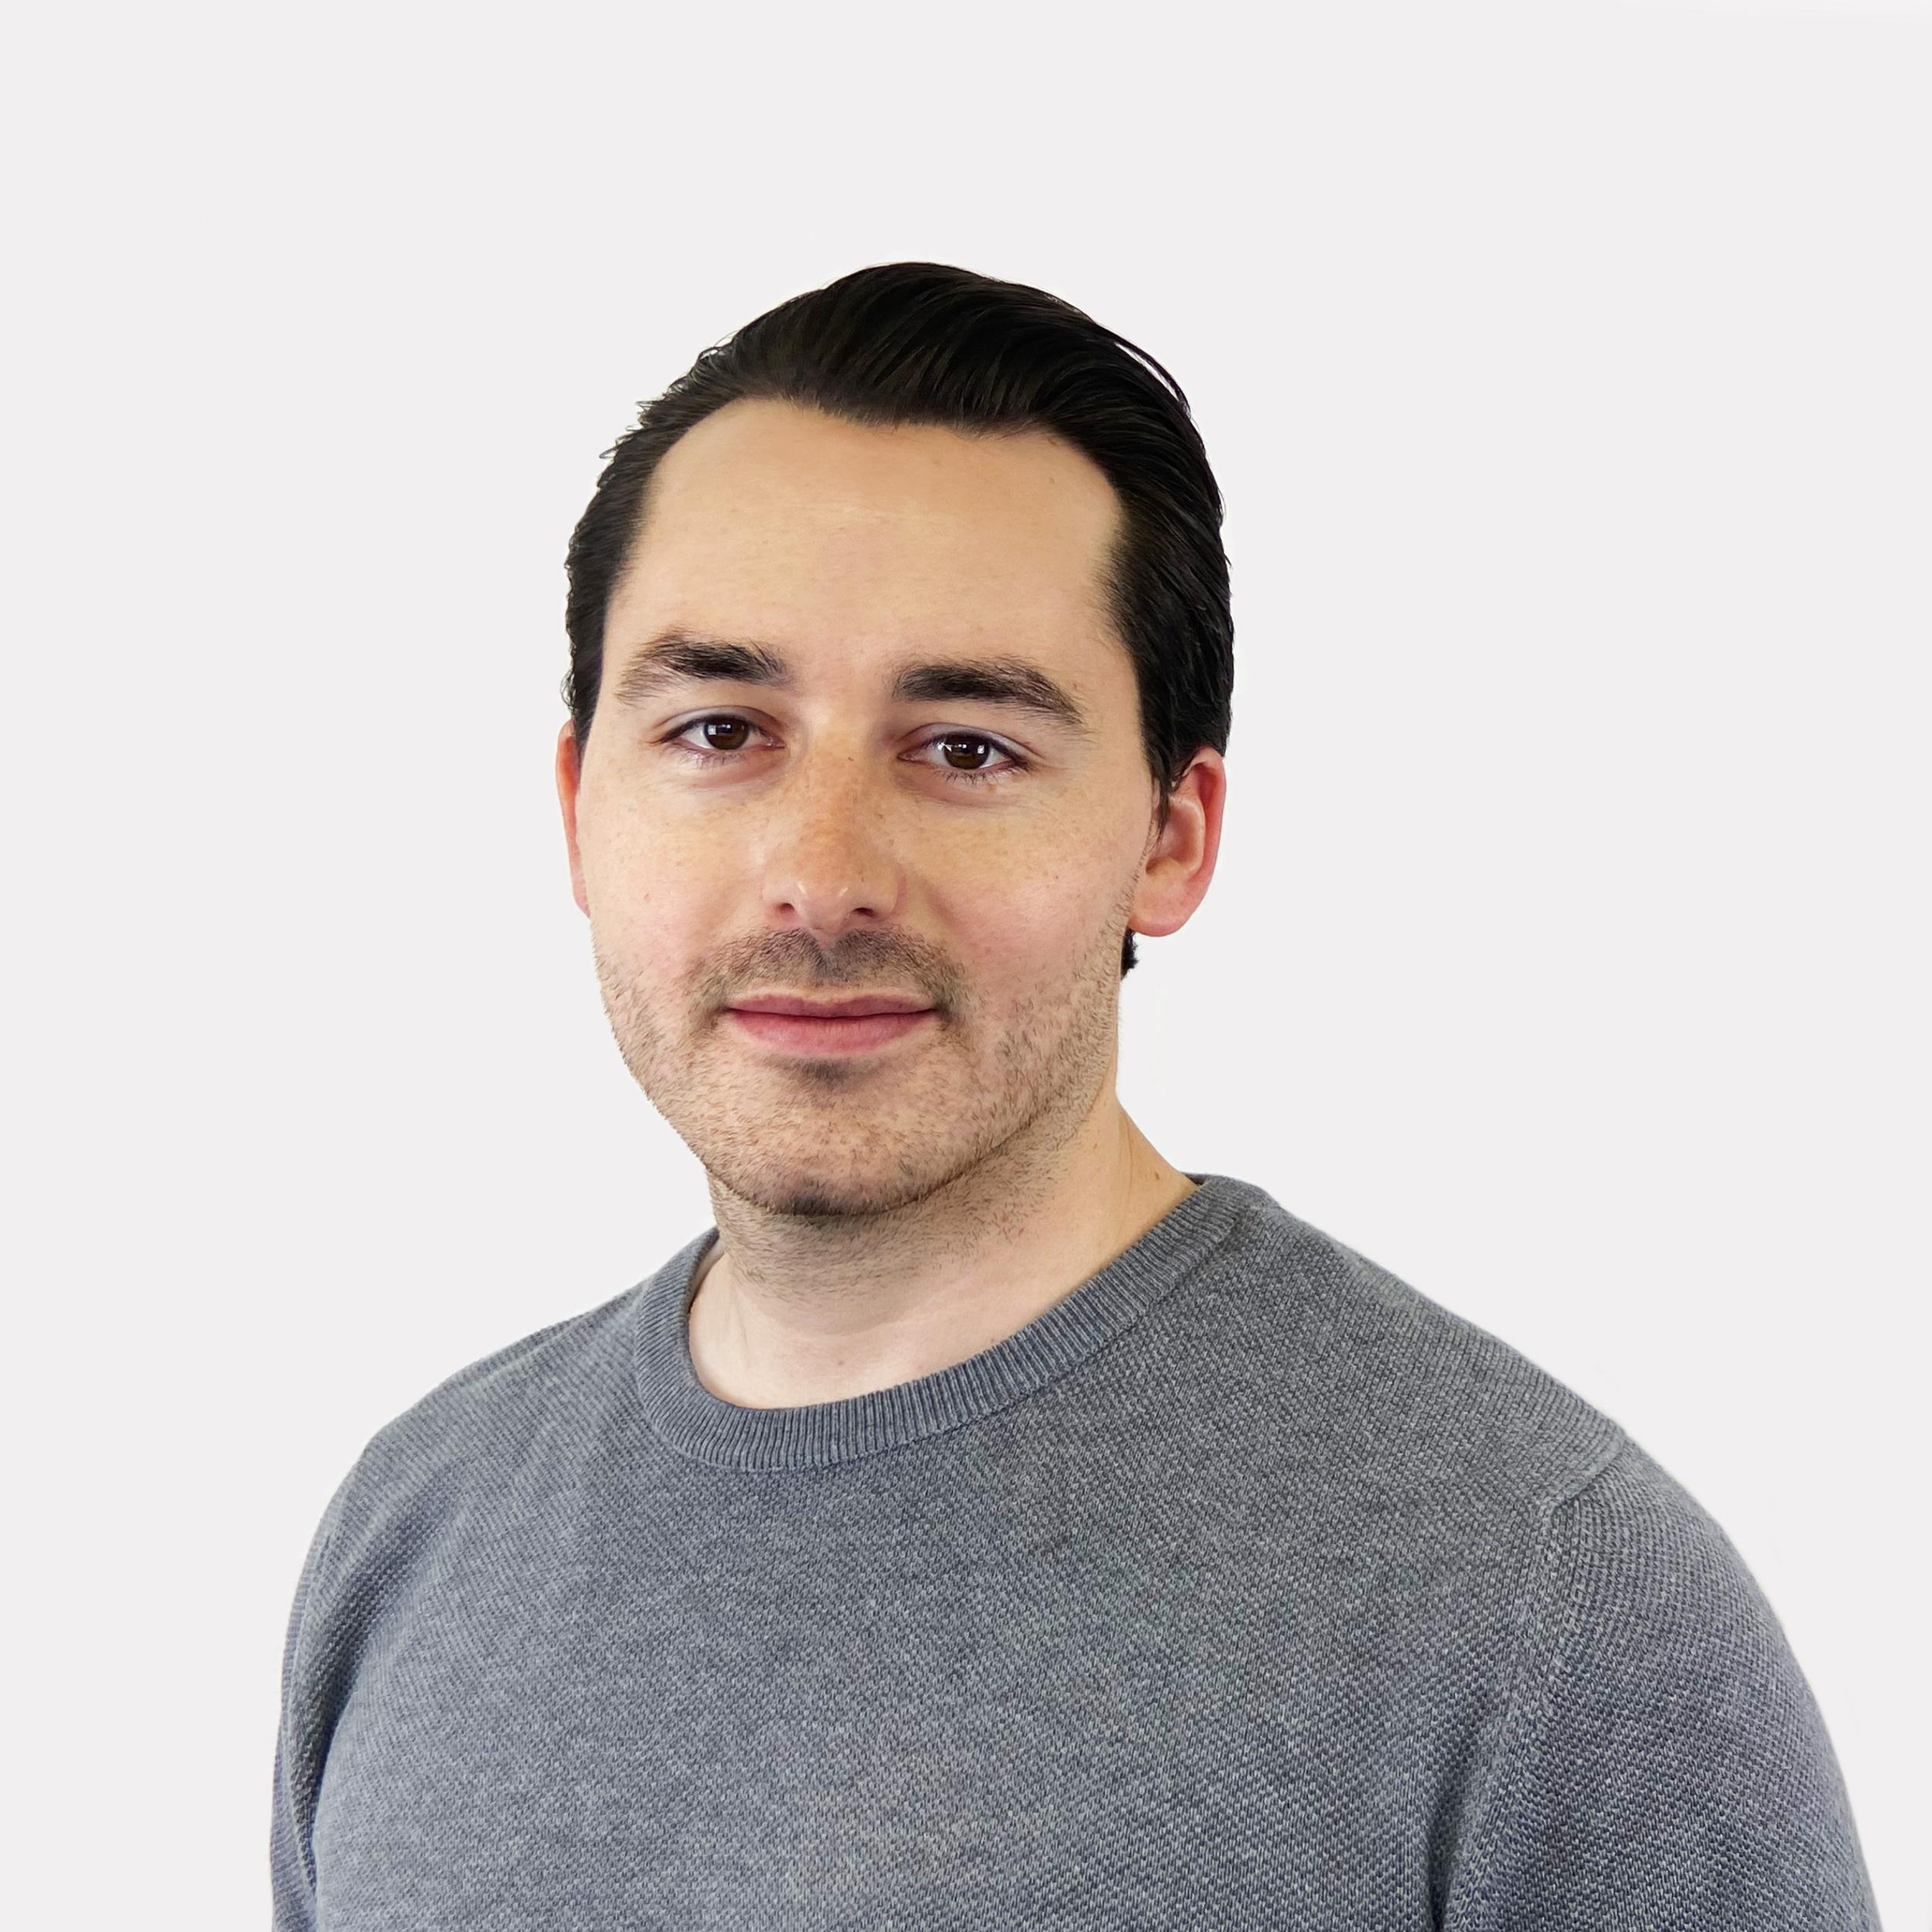 Daniel Curiger COO of Fixposition